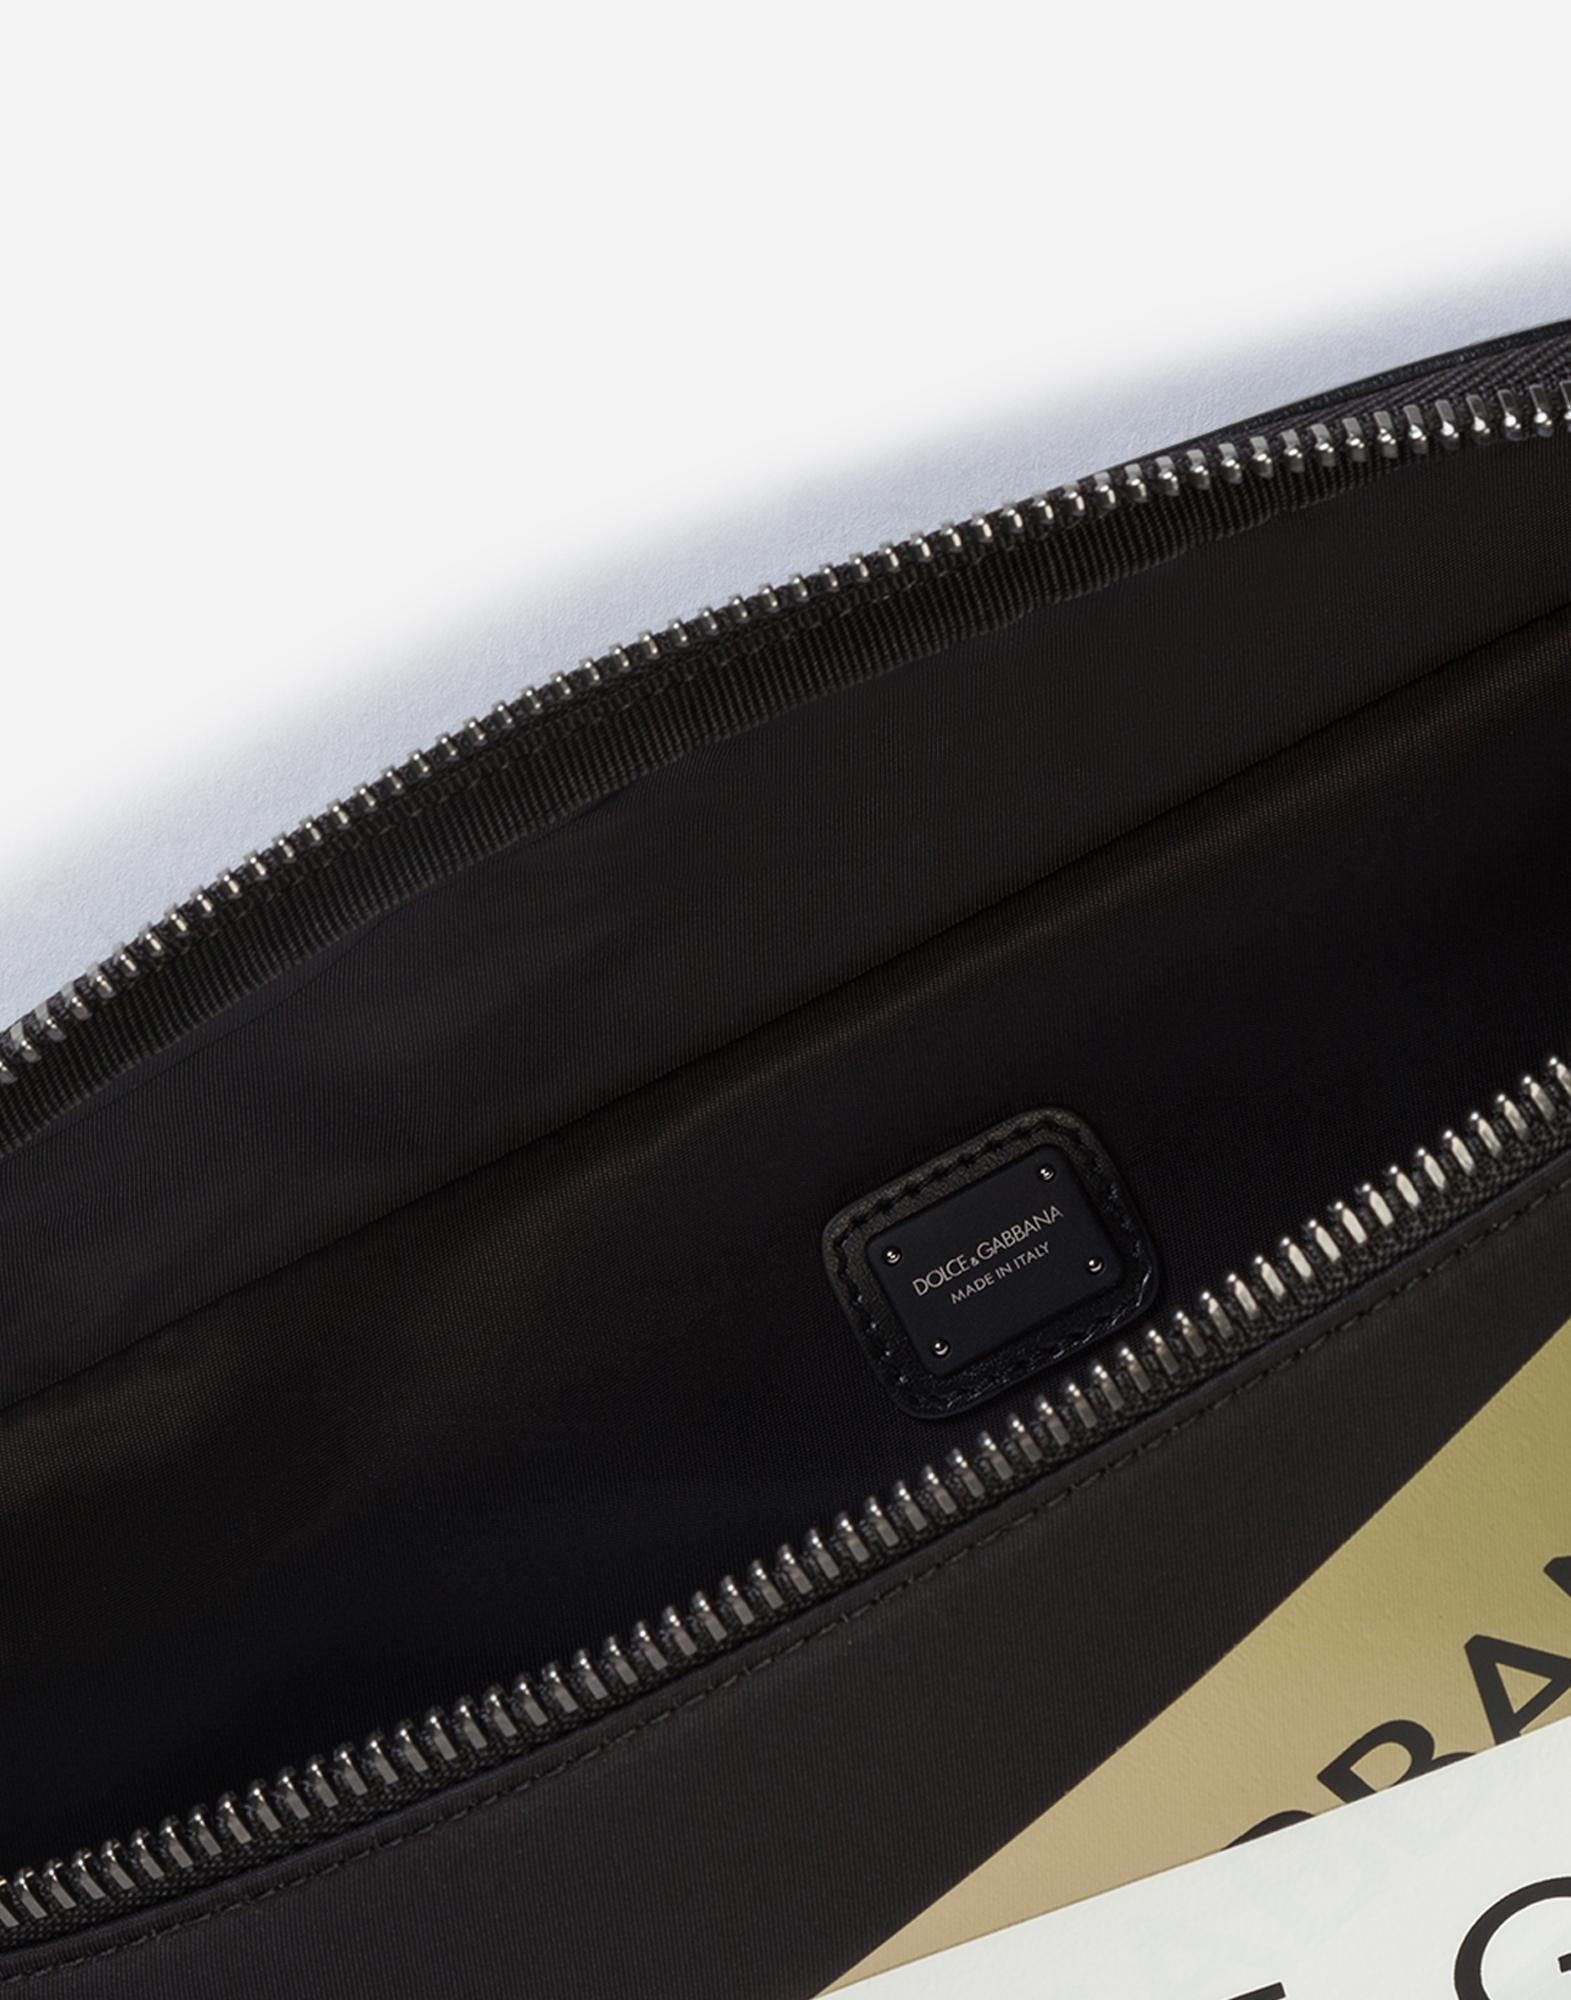 Dolce & Gabbana STREET POUCH IN PRINTED NYLON